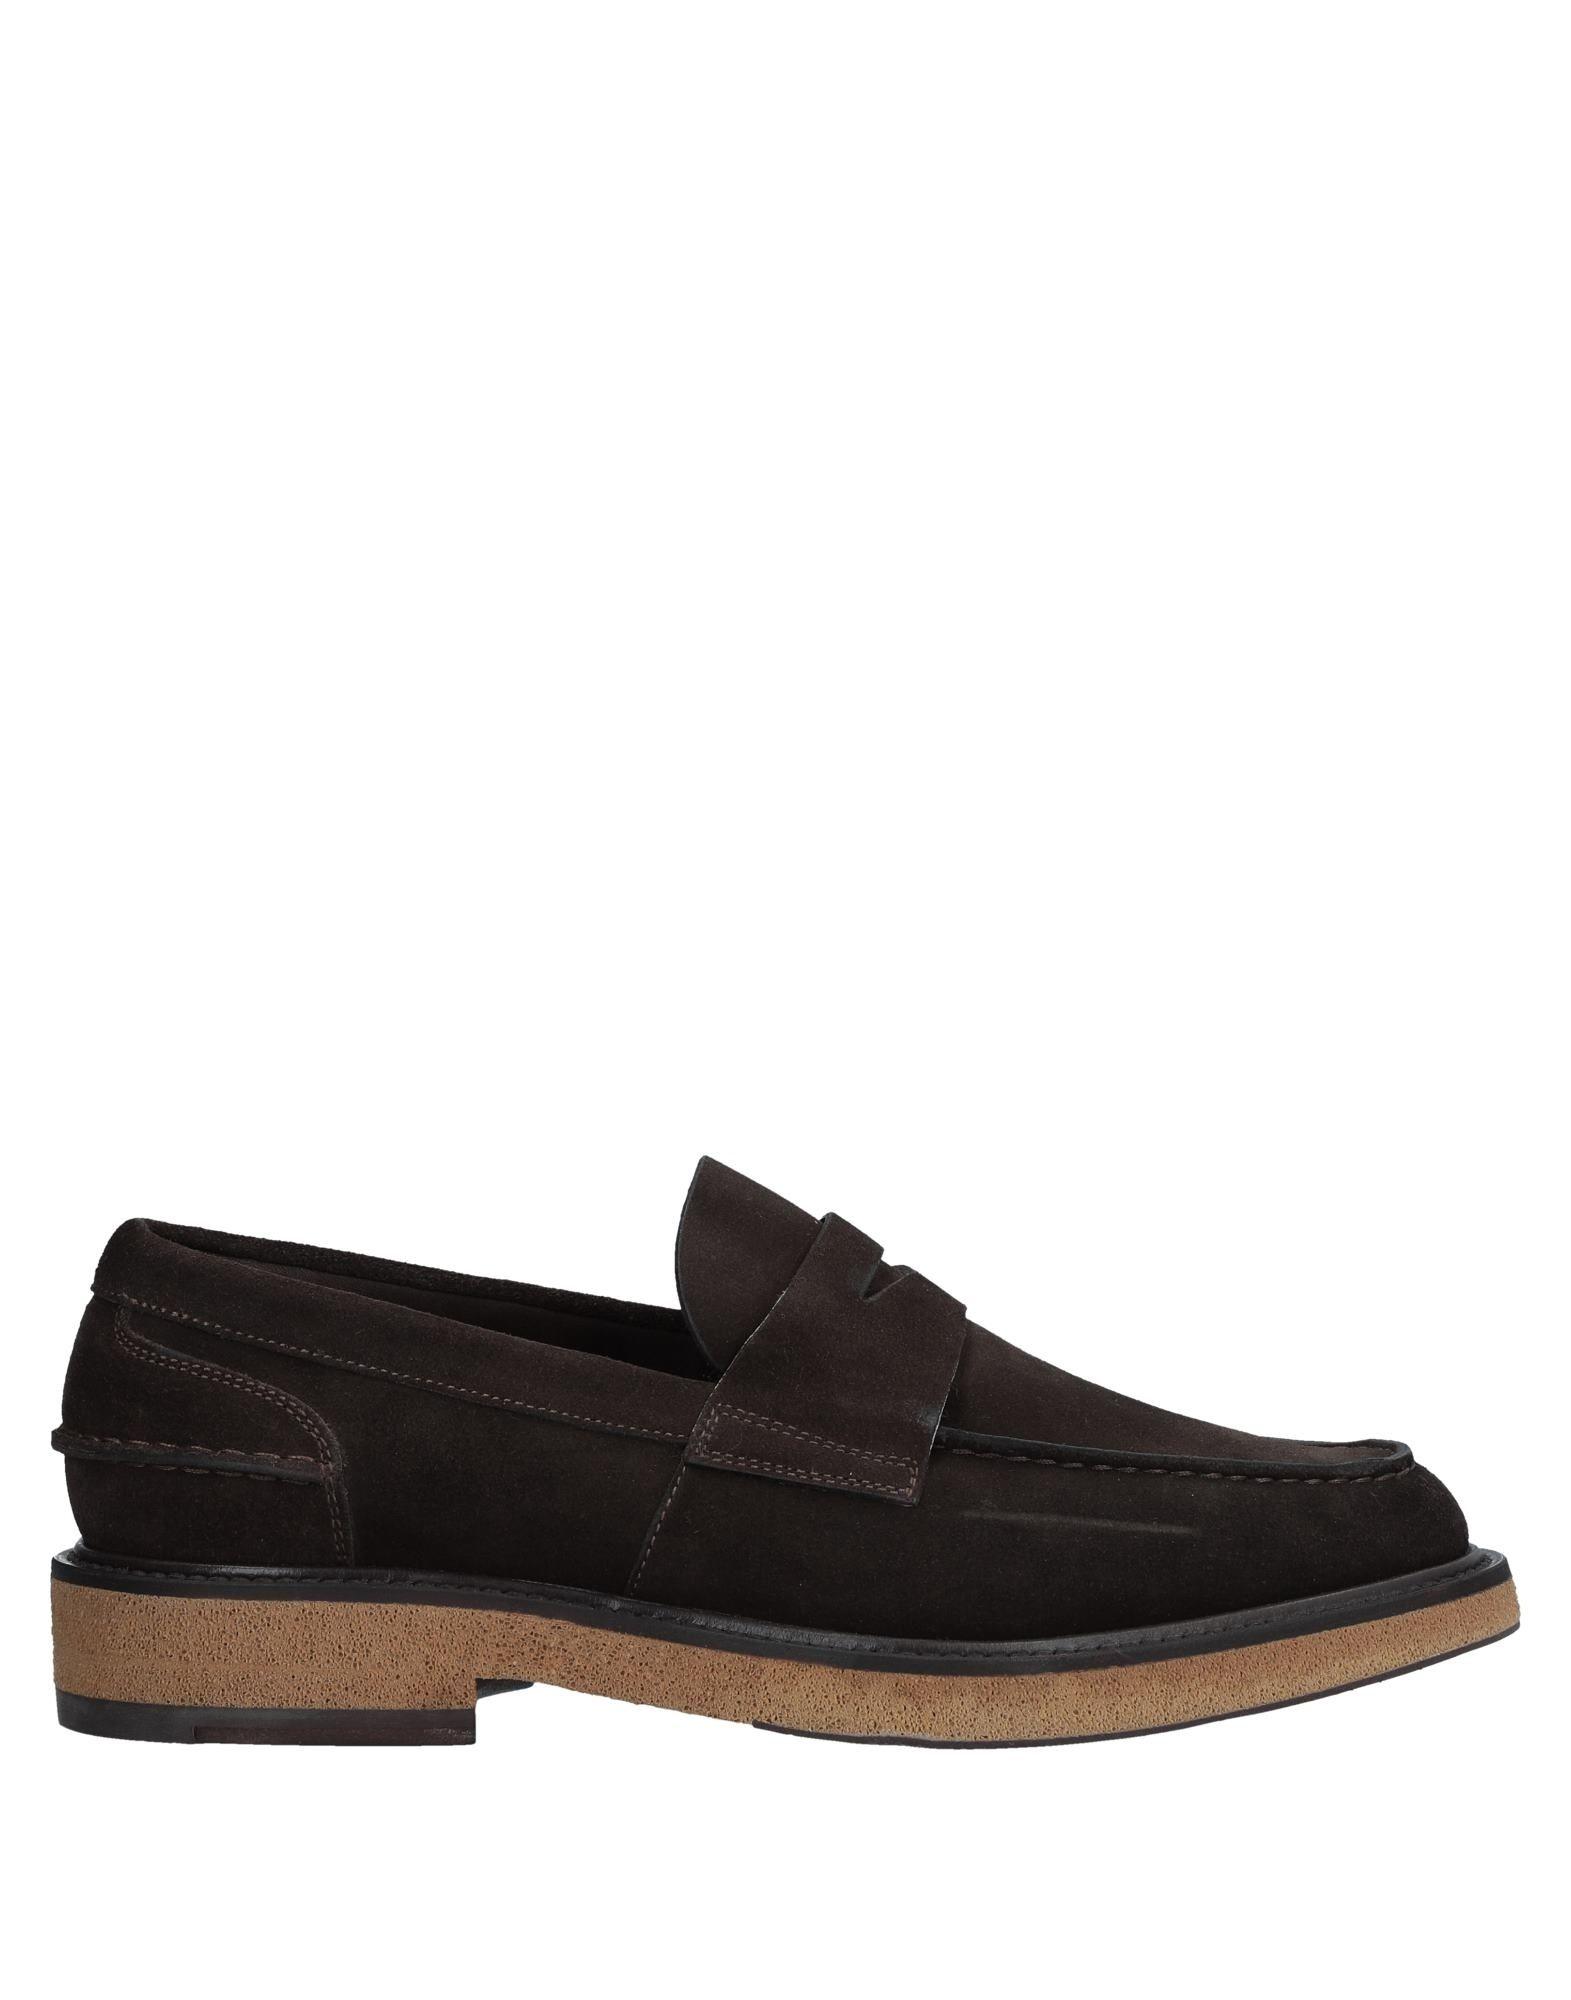 Santoni Mokassins Herren  11542127KA Gute Qualität beliebte Schuhe